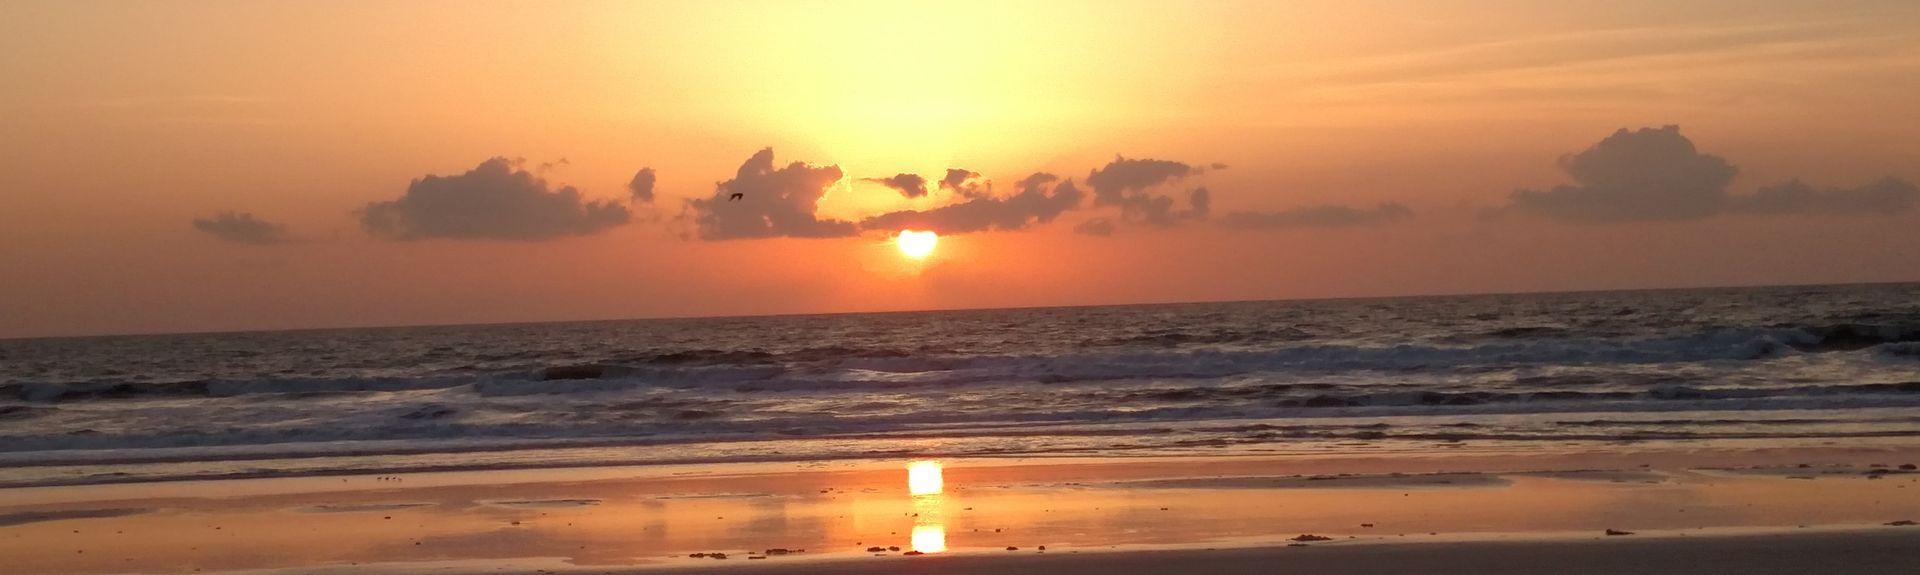 Atlantic Beach, FL, USA